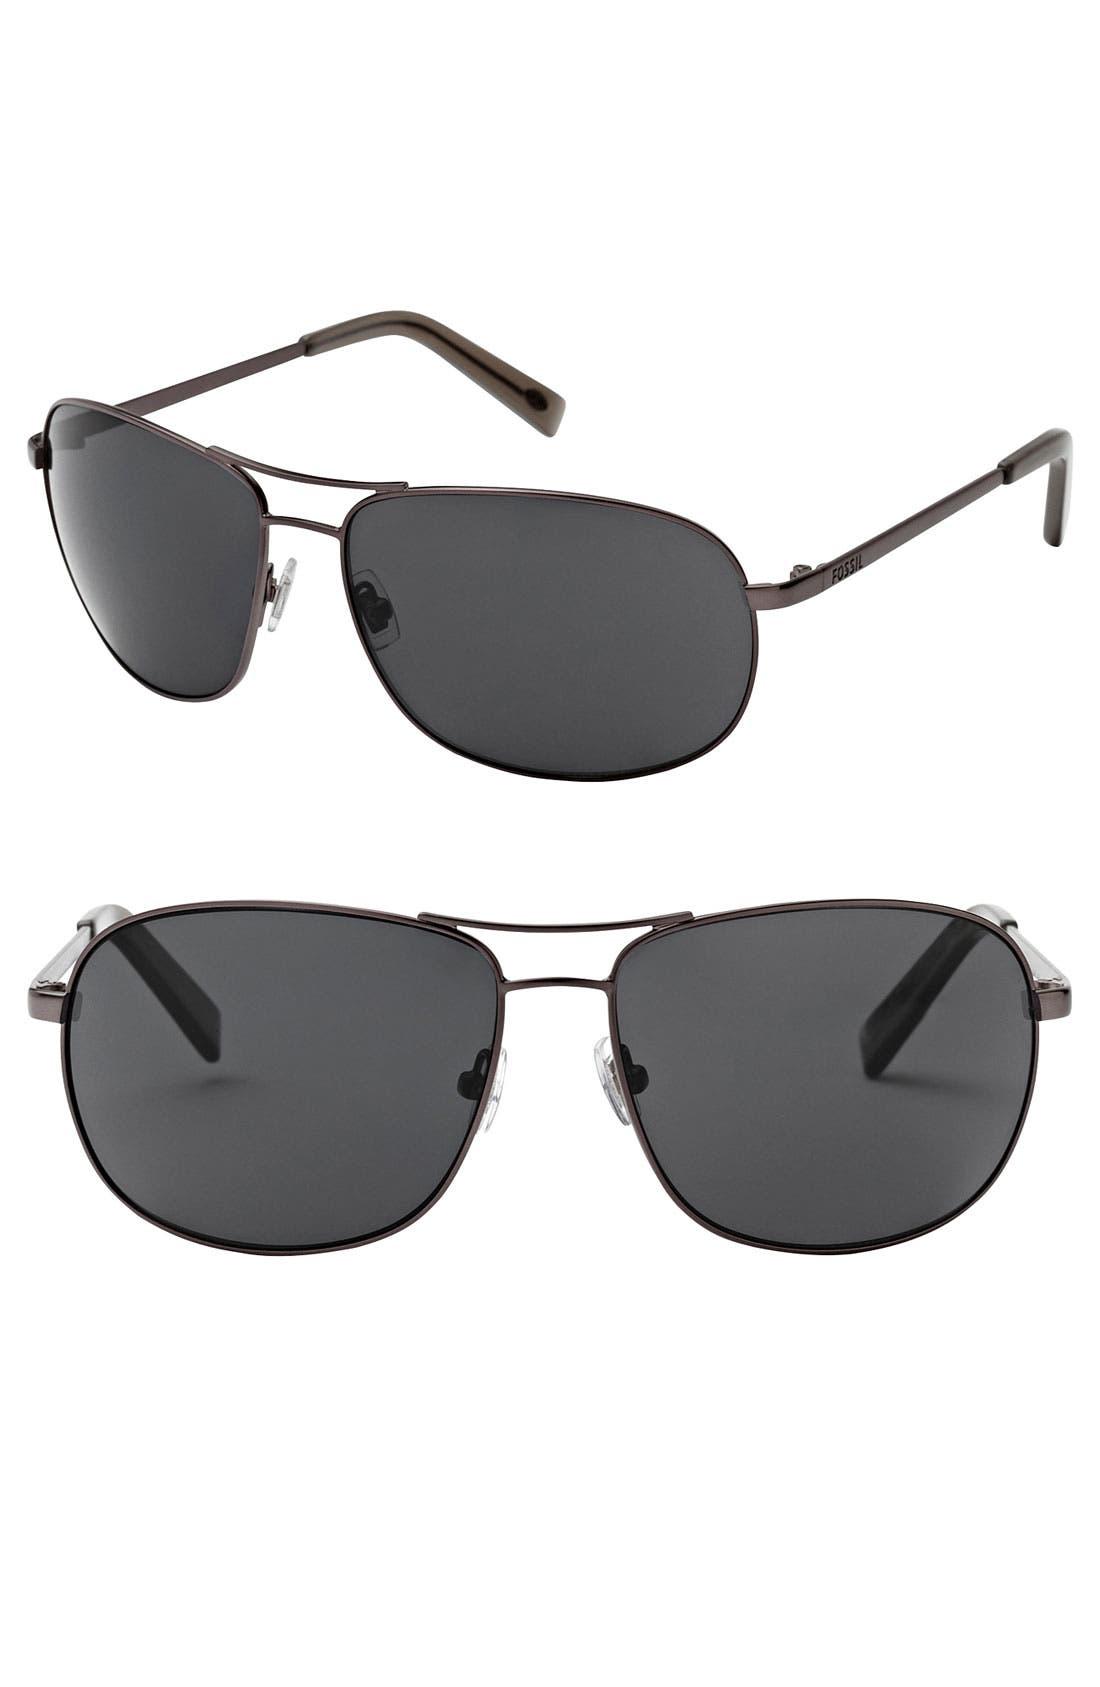 Alternate Image 1 Selected - Fossil 'Dylan' 62mm Aviator Sunglasses